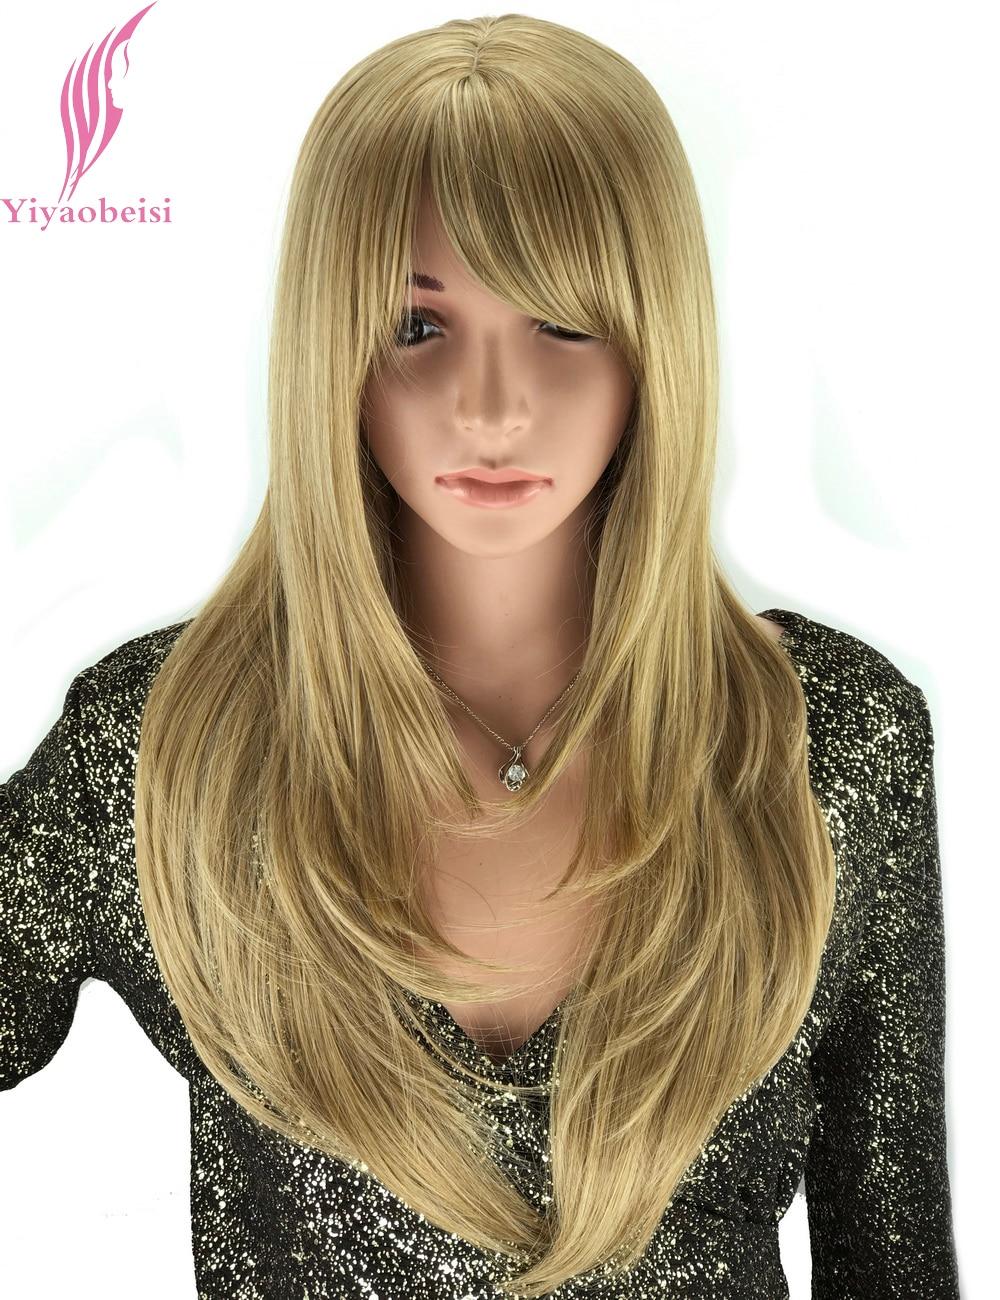 Yiyaobess 50cm European Natural Hairstyles With Bangs Heat ...